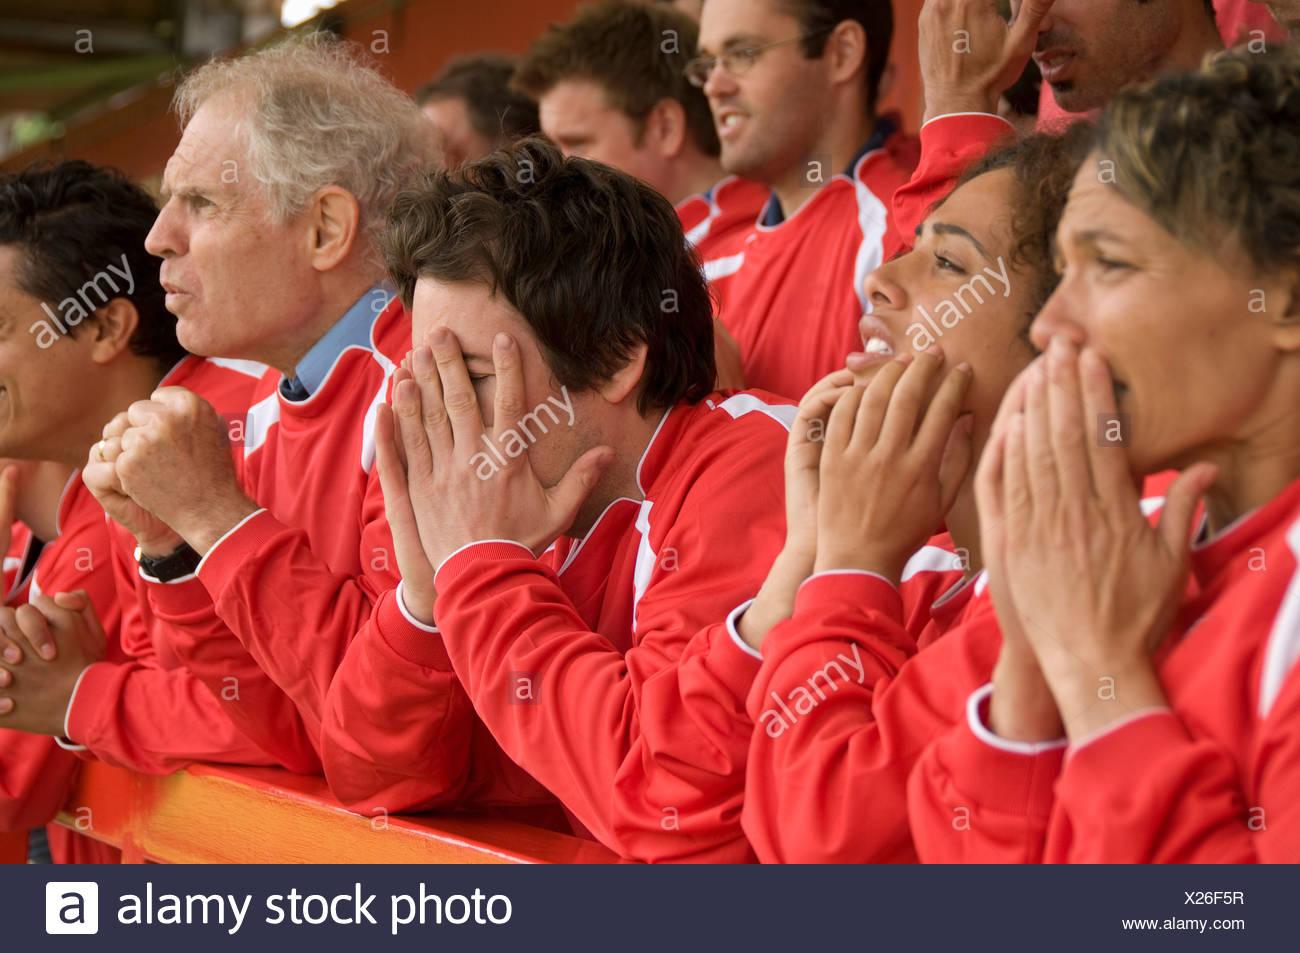 Despairing fans at football match - Stock Image